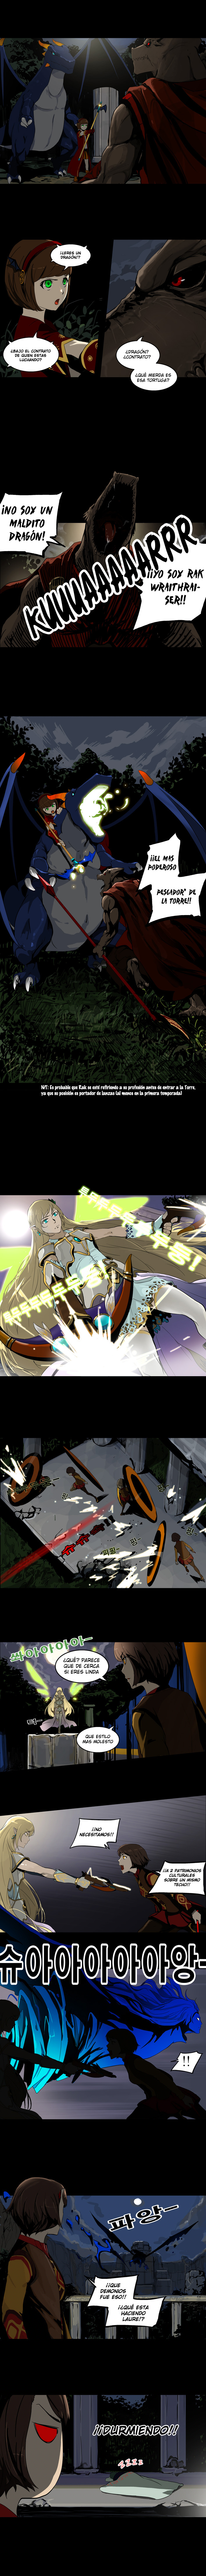 https://c5.ninemanga.com/es_manga/21/149/424360/6a7b6d66dba243496835d7fe2277b84d.jpg Page 2